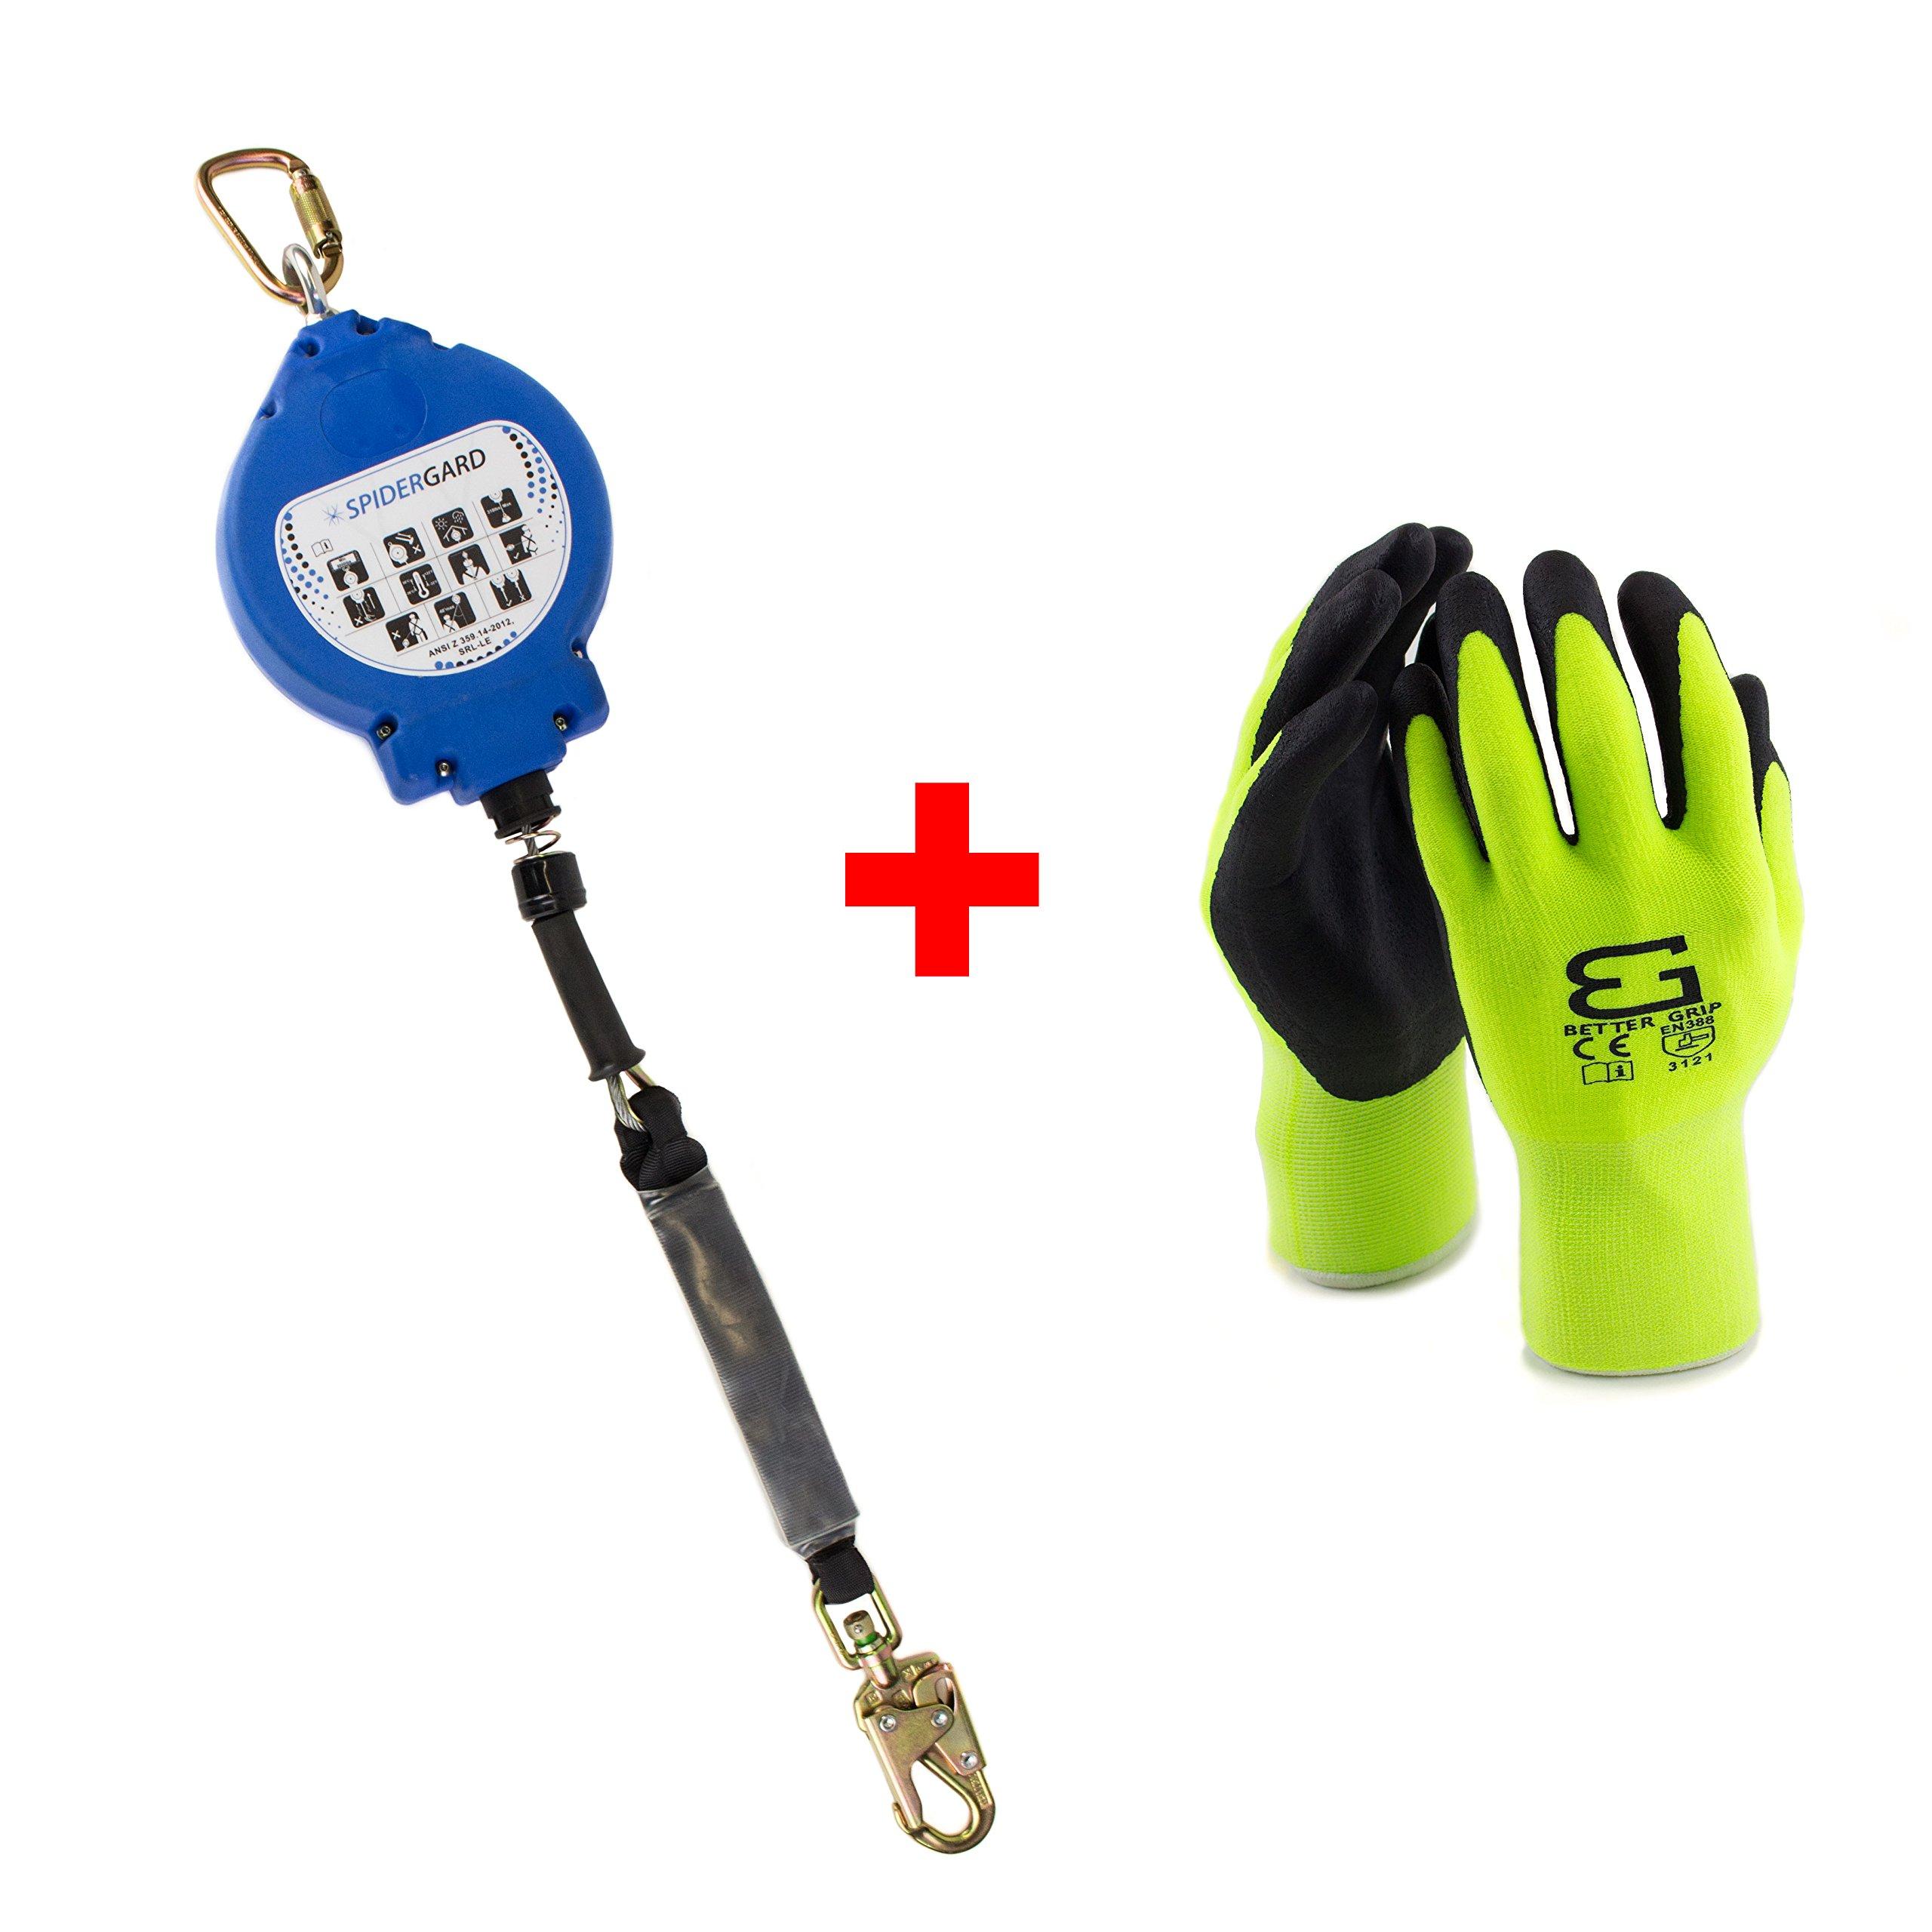 Spidergard SPL-RR50 50 Foot Wire Rope Self-Retracting Lifeline with Swivel Hook and Carabiner w/ Micro Foam Work Glove by Spidergard (Image #1)